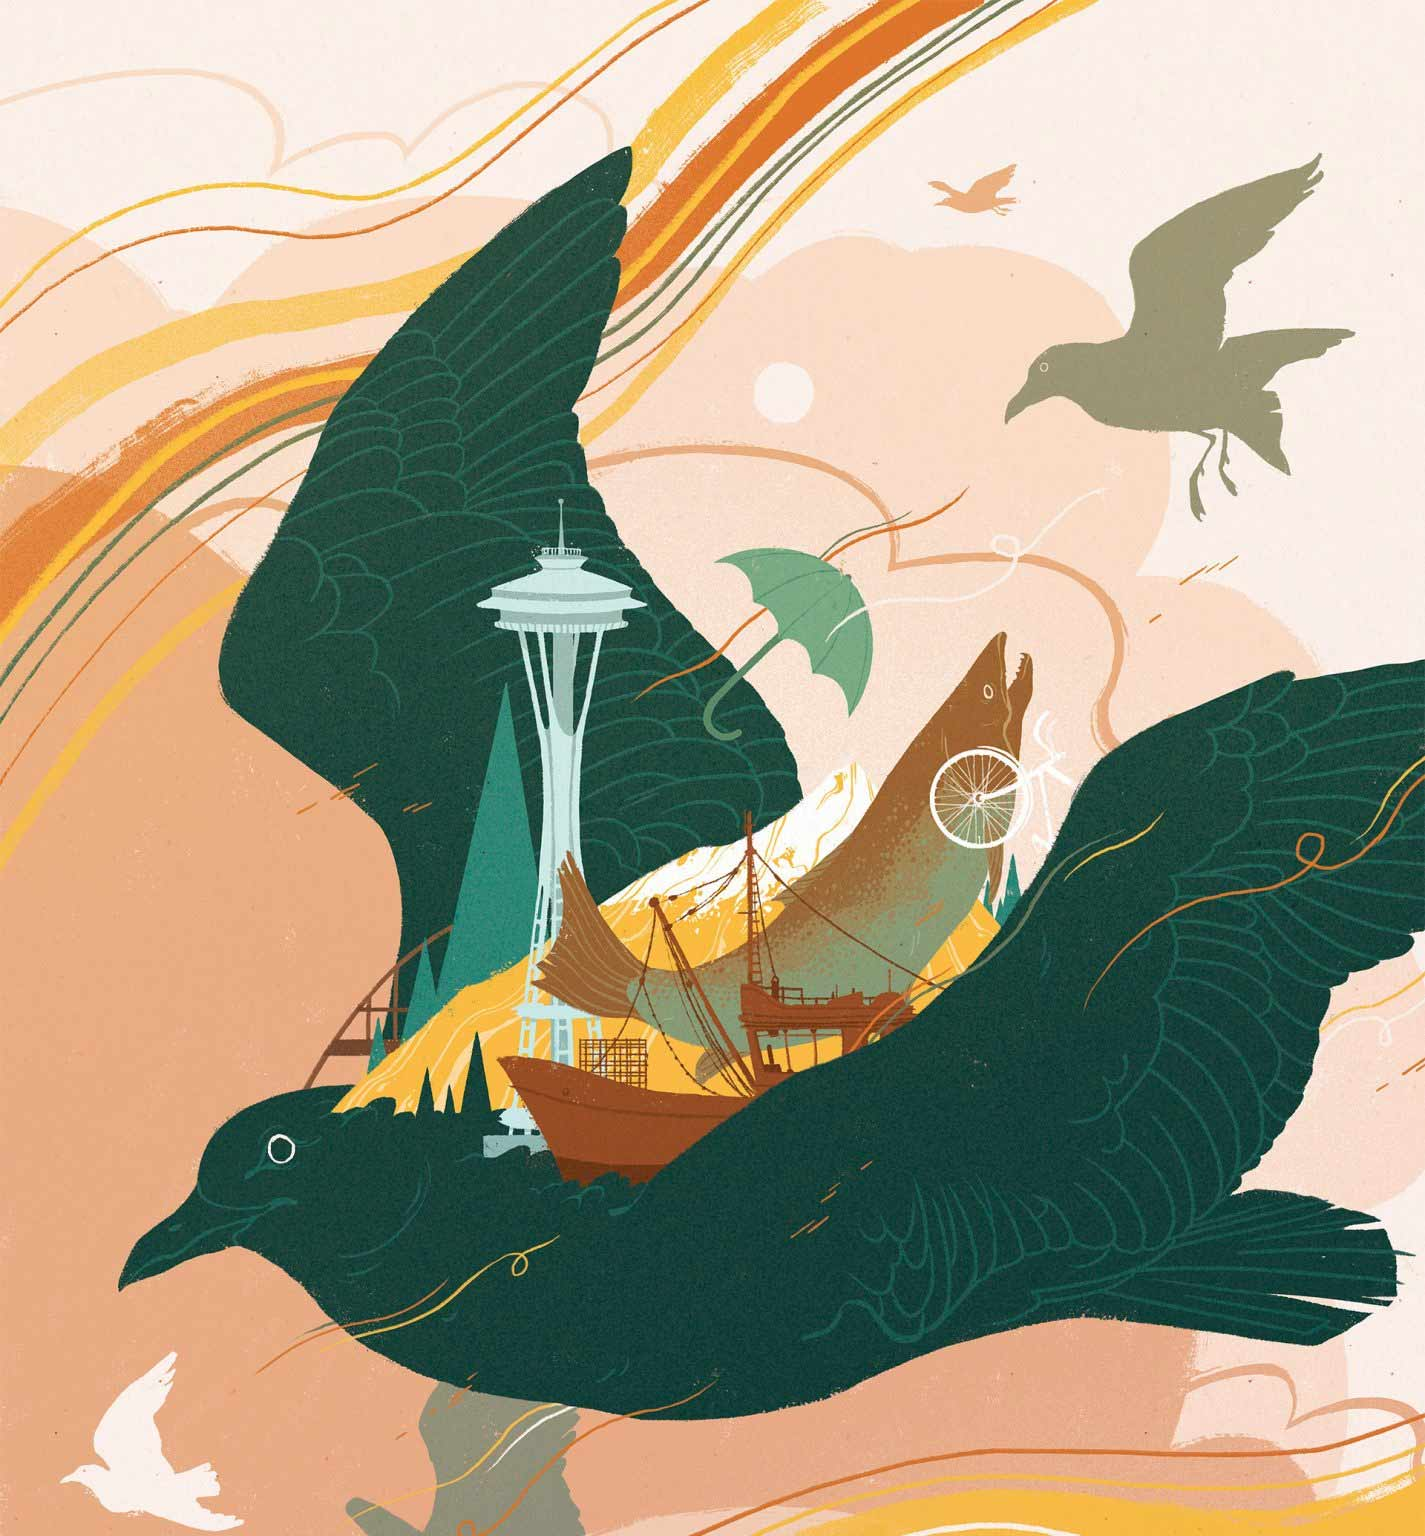 Illustrationen von Samantha Mash samantha-mash-illustrationen_05